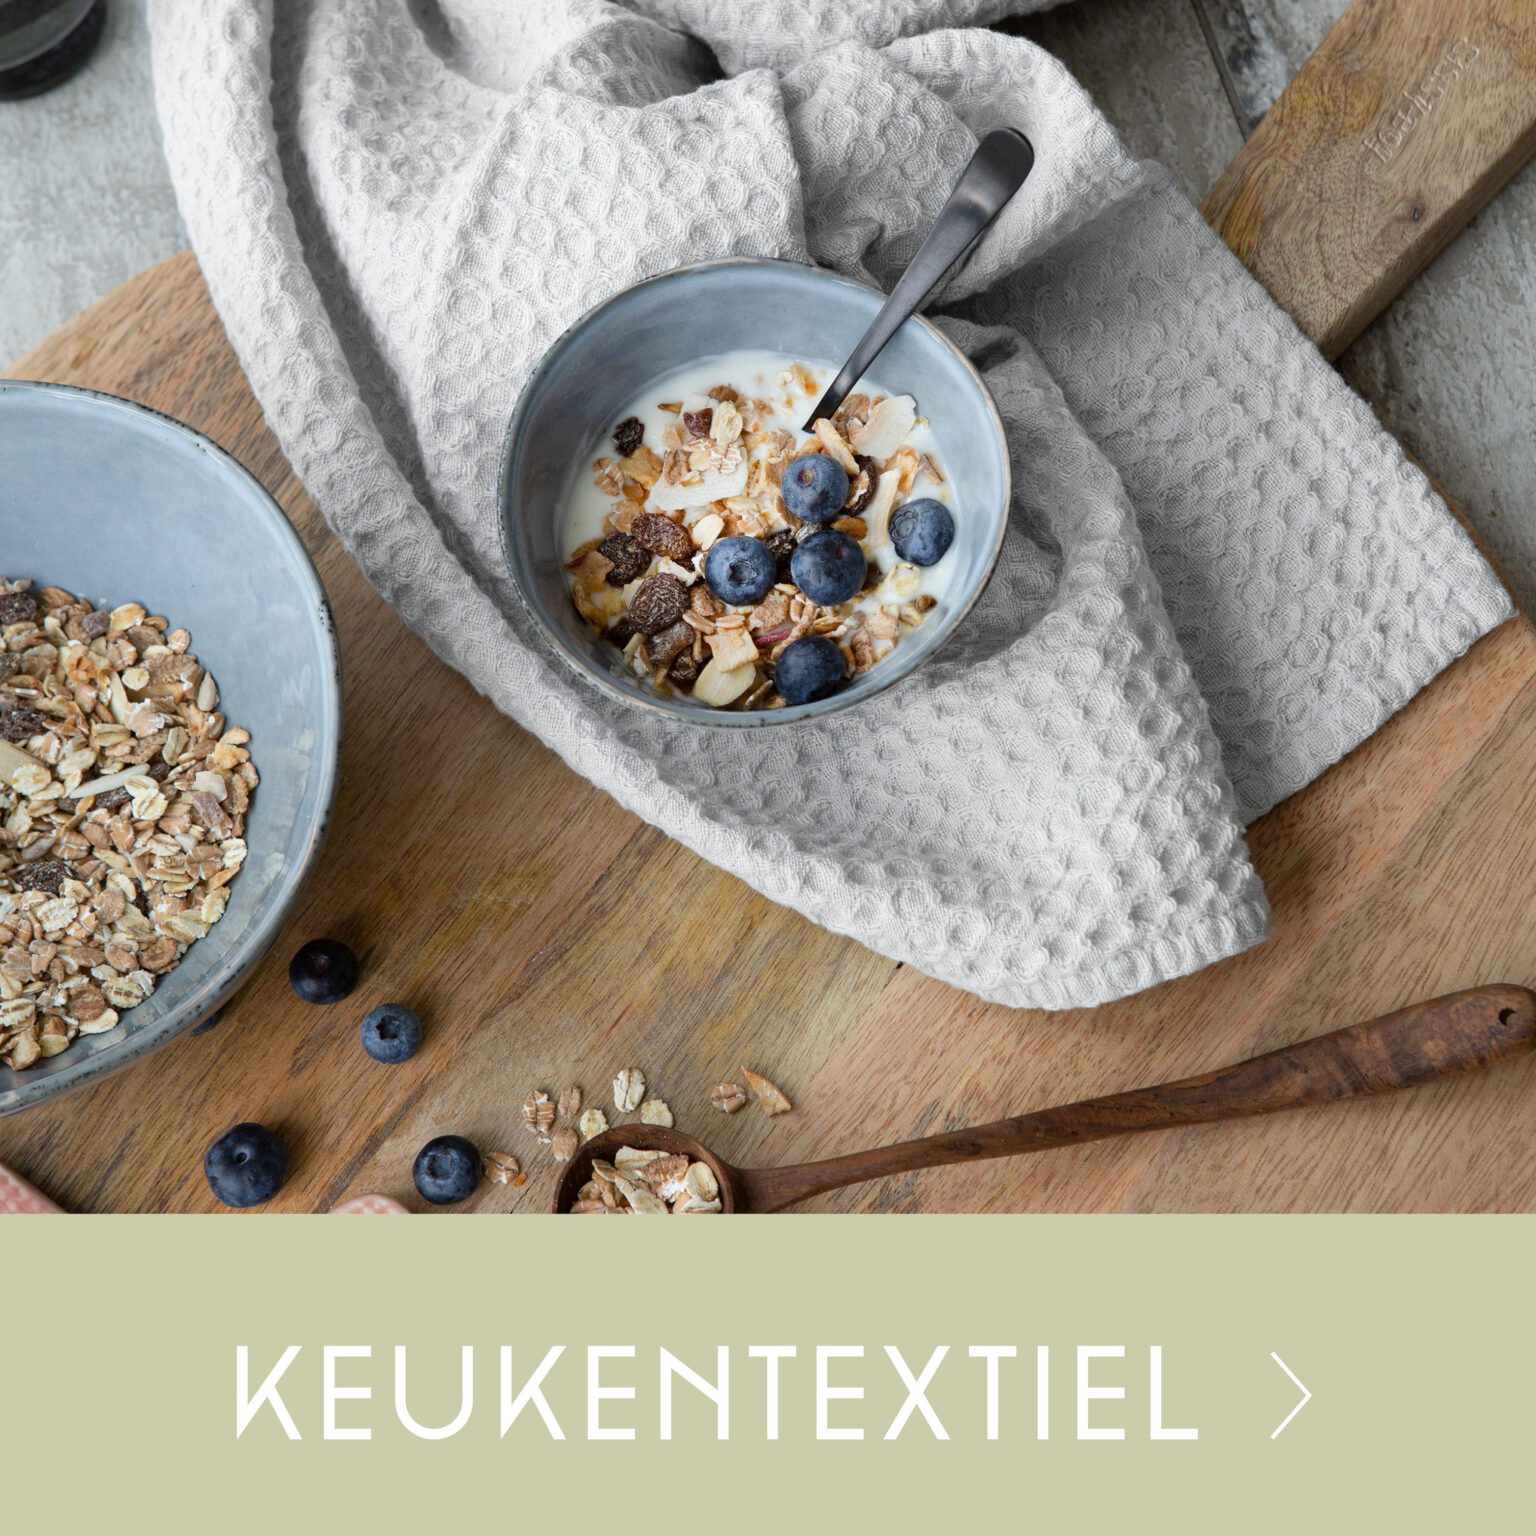 Keukentextiel-kopen